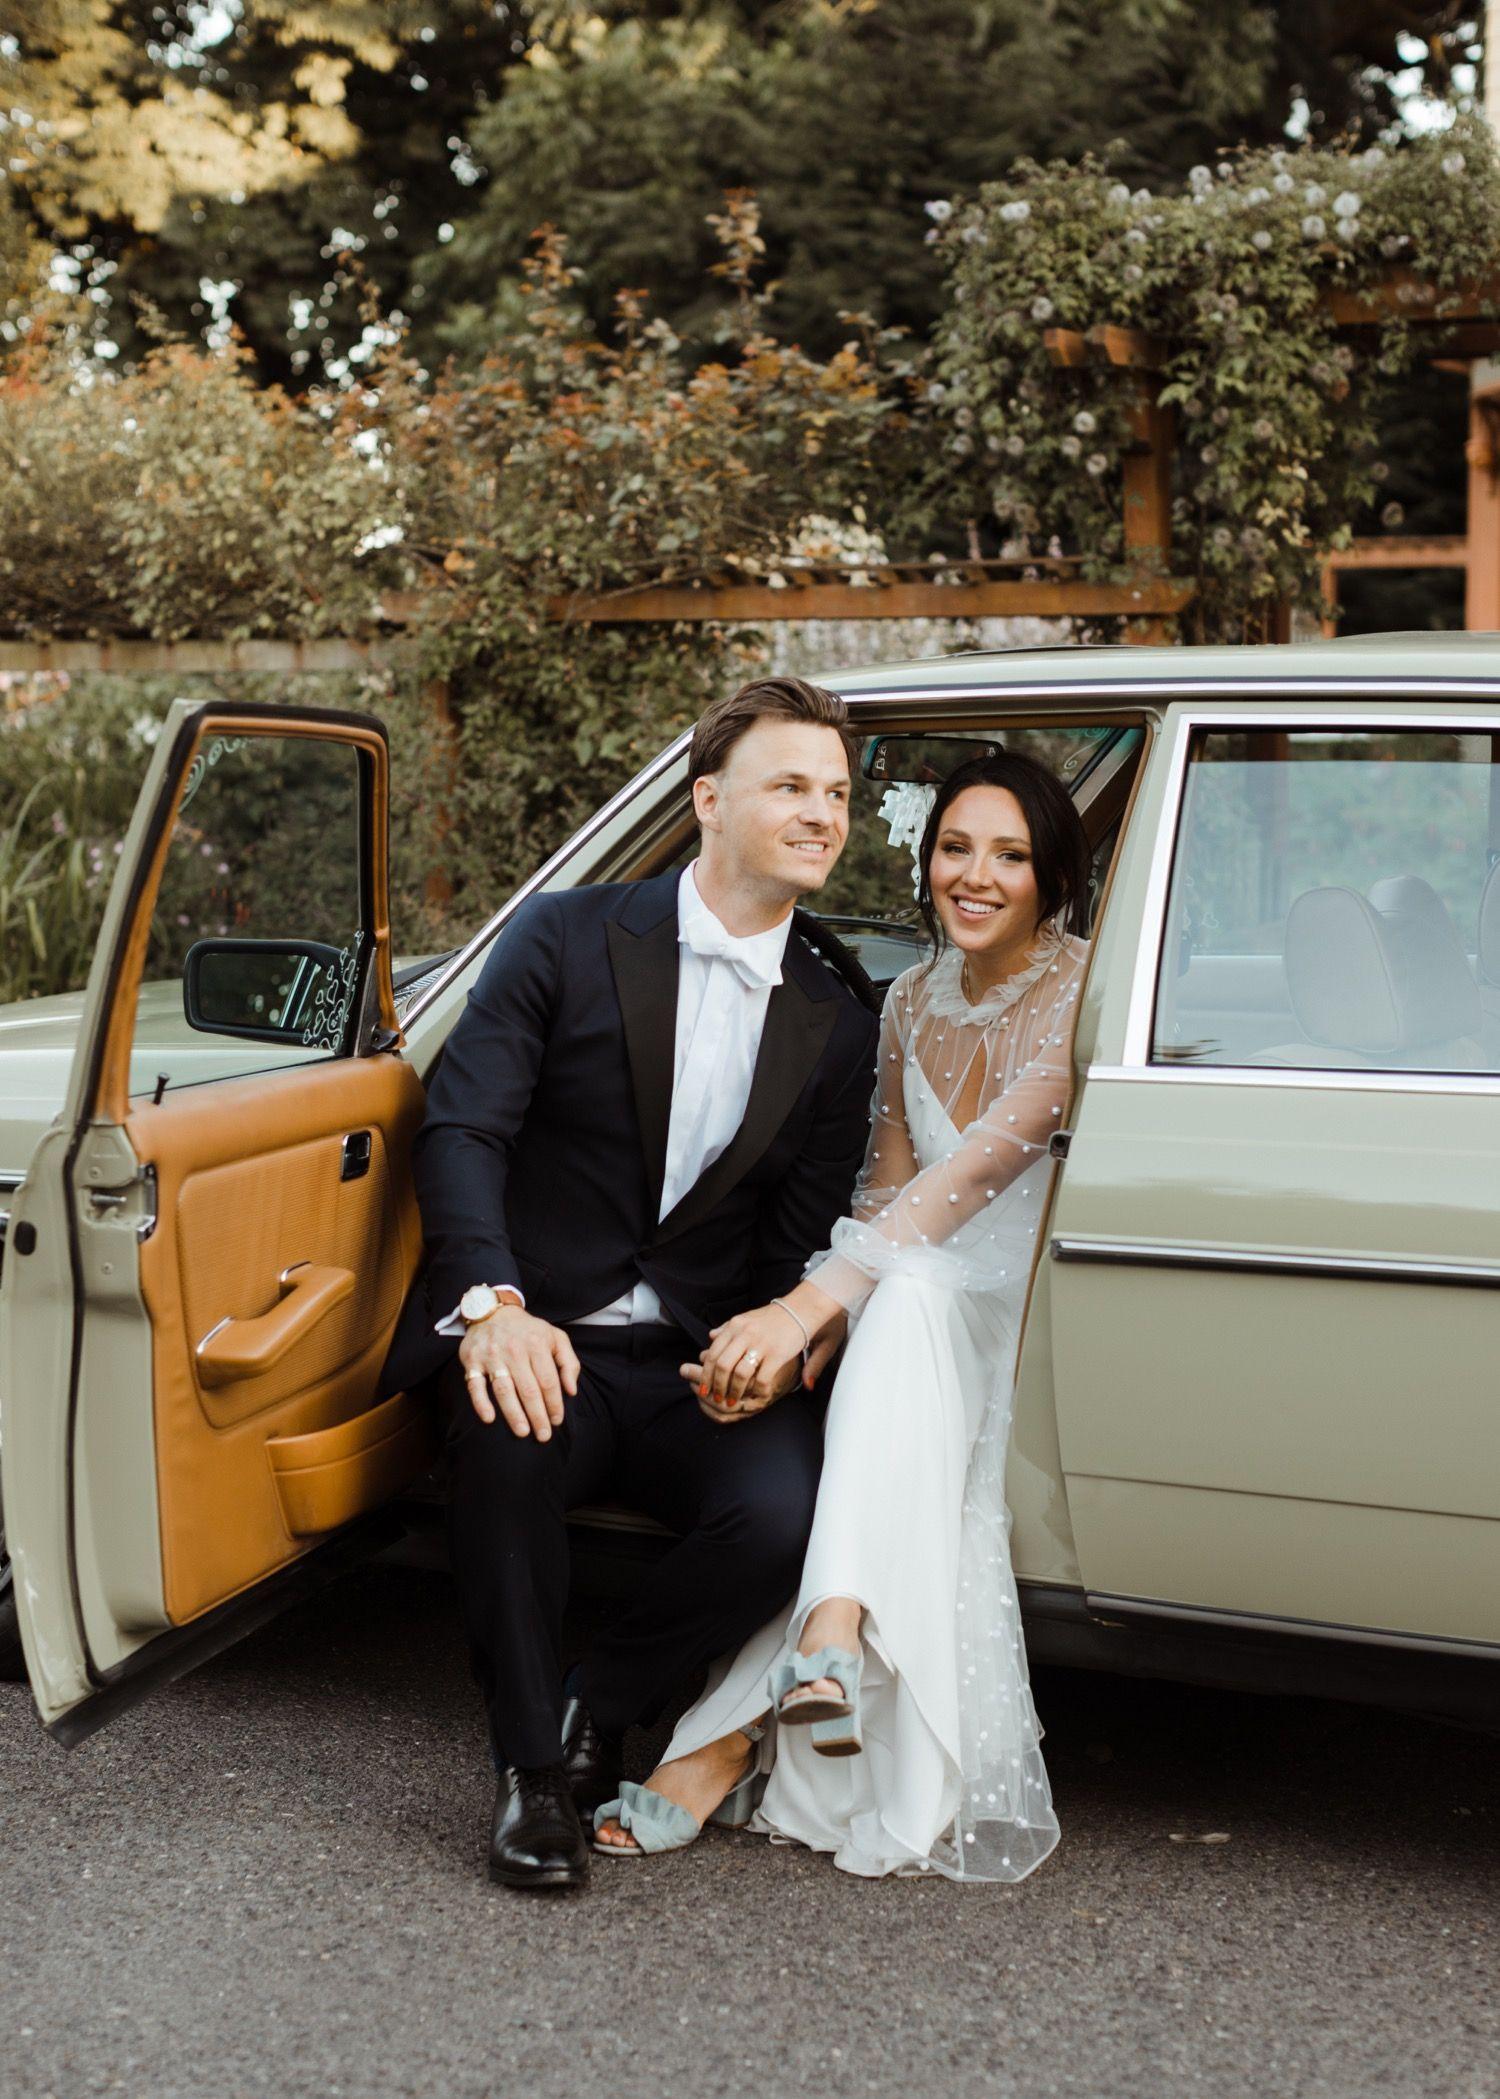 Backyard Wedding Attire